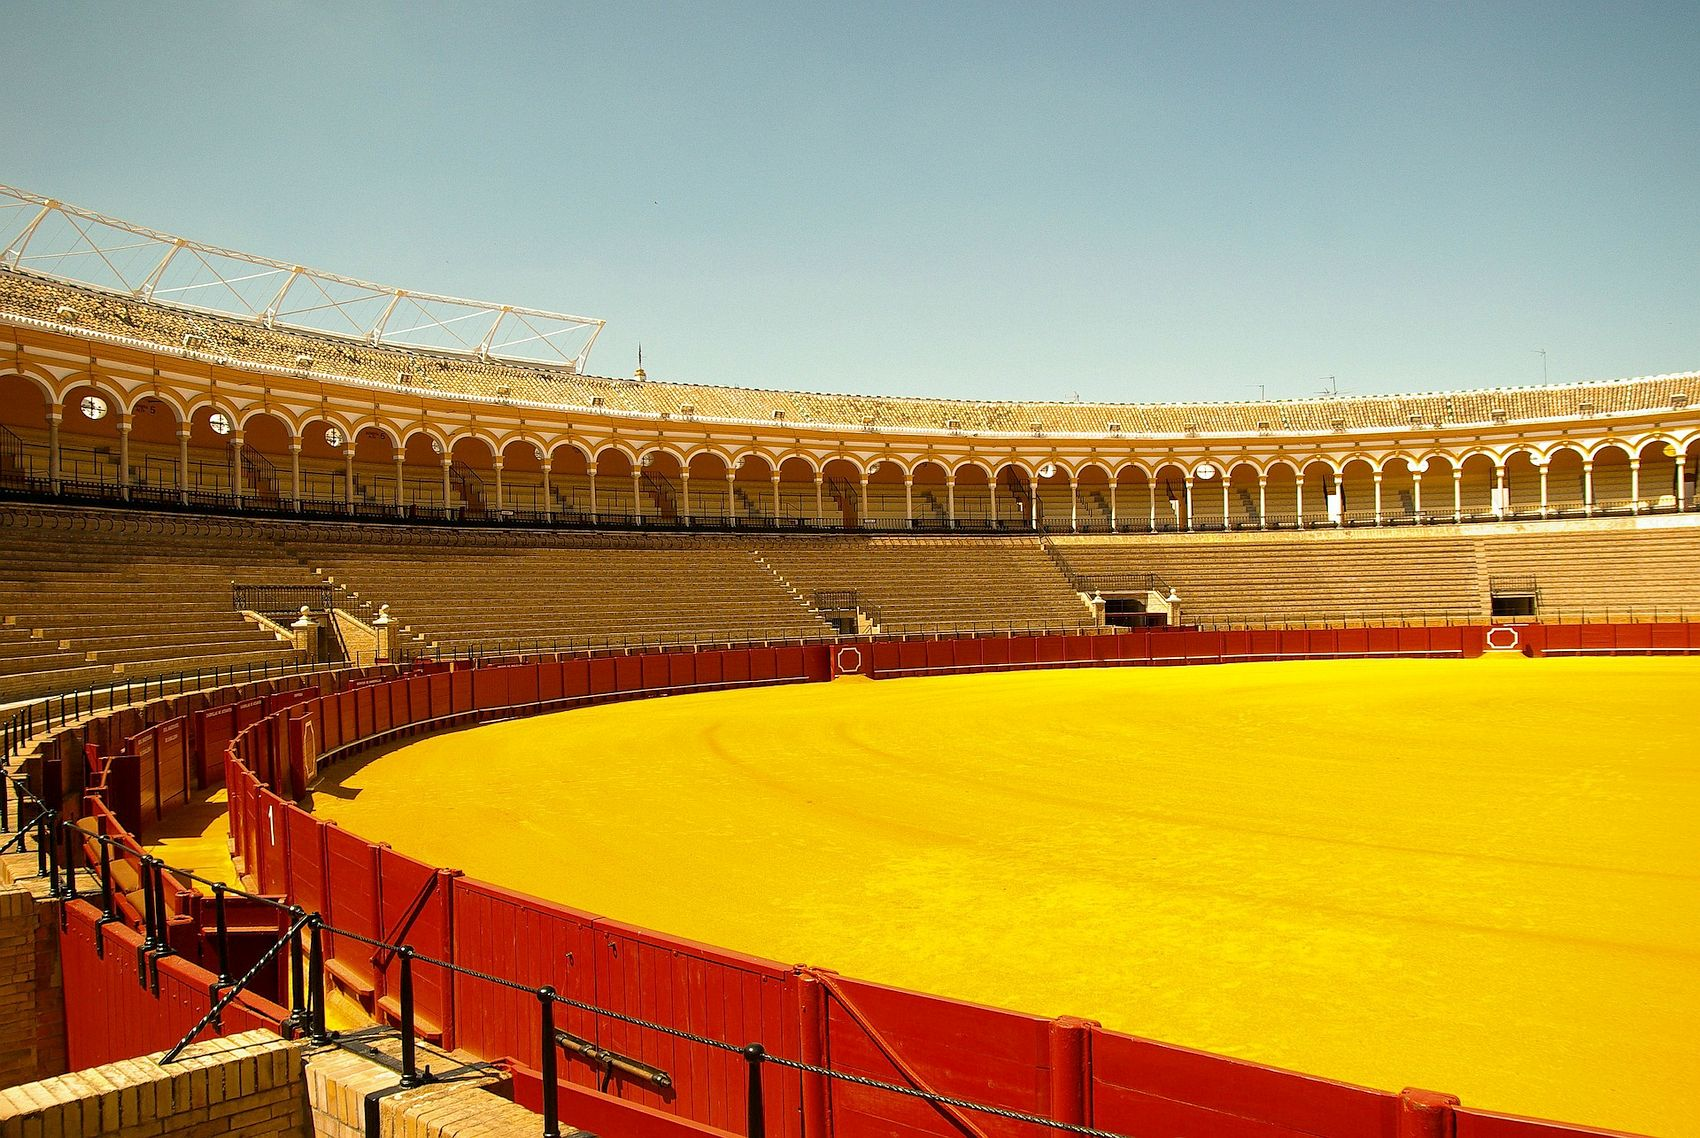 Bullring in Seville